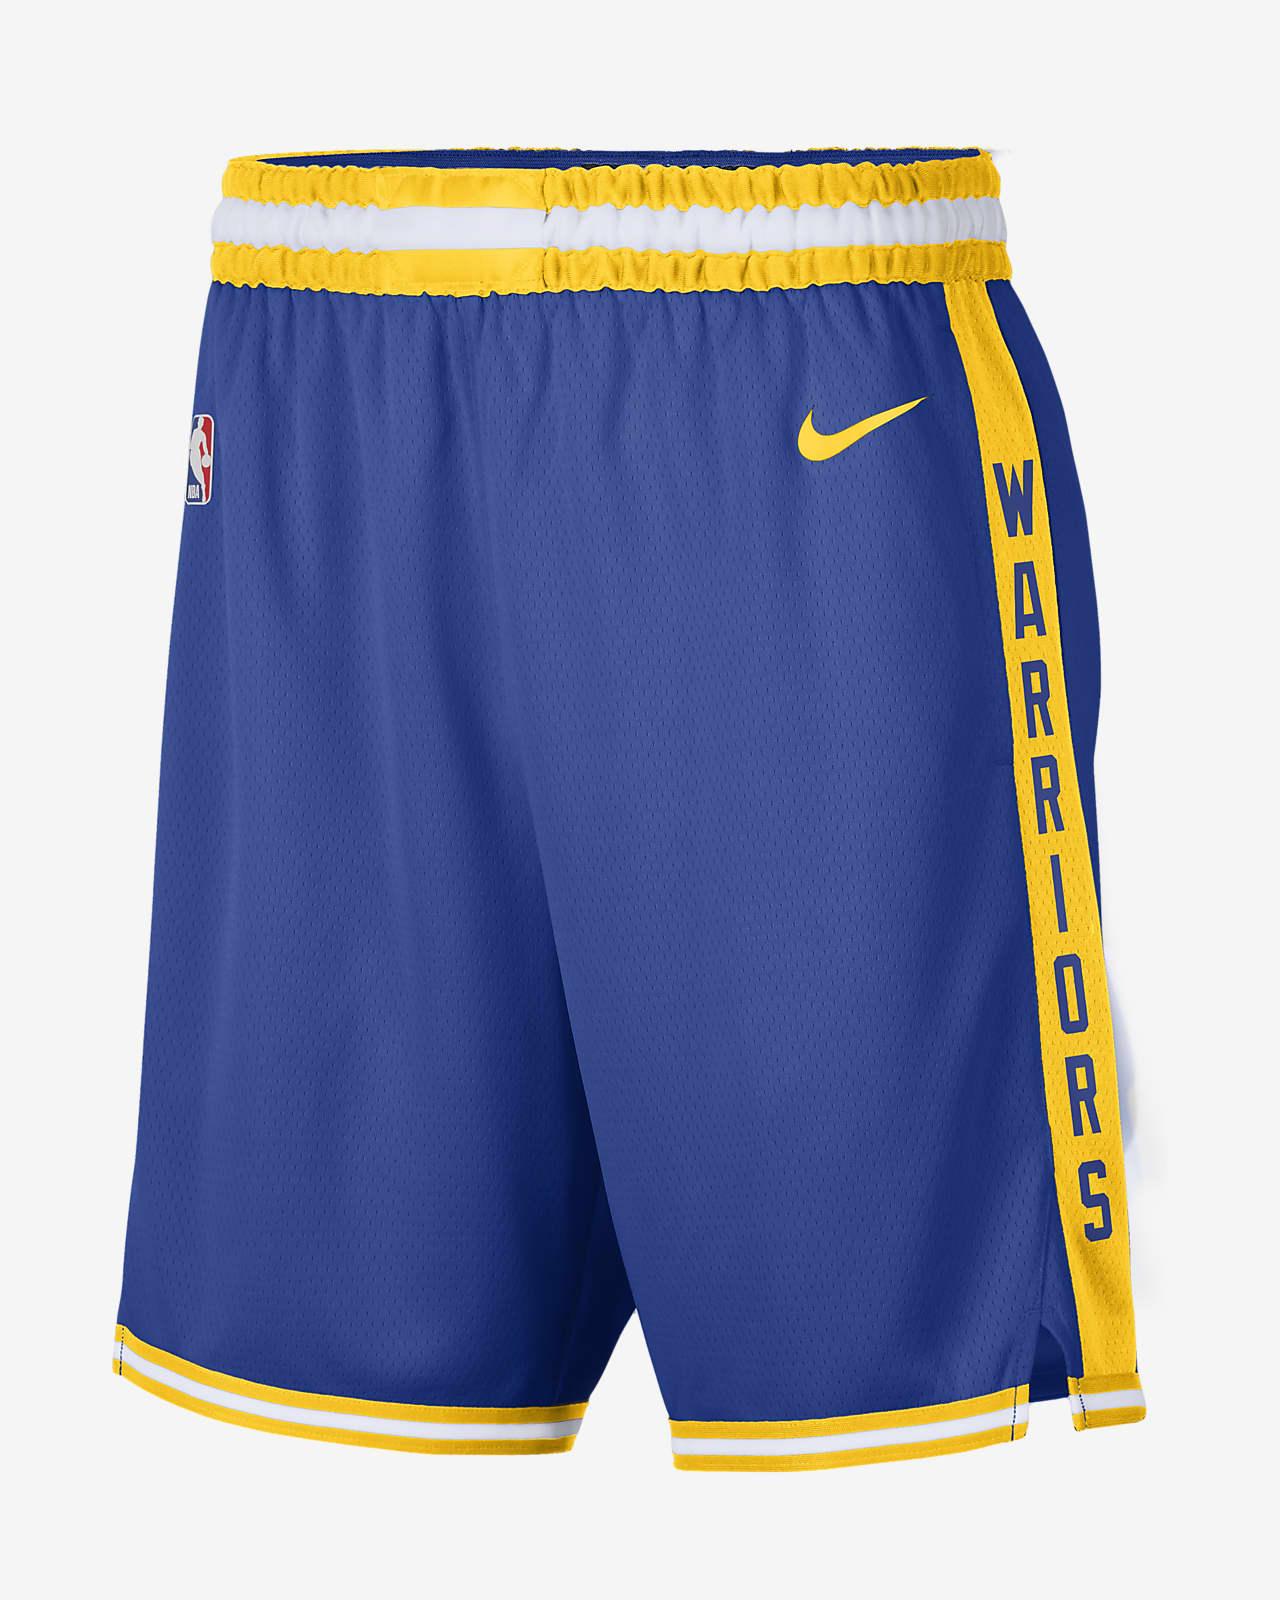 Golden State Warriors Classic Edition 2020 Men's Nike NBA Swingman Shorts